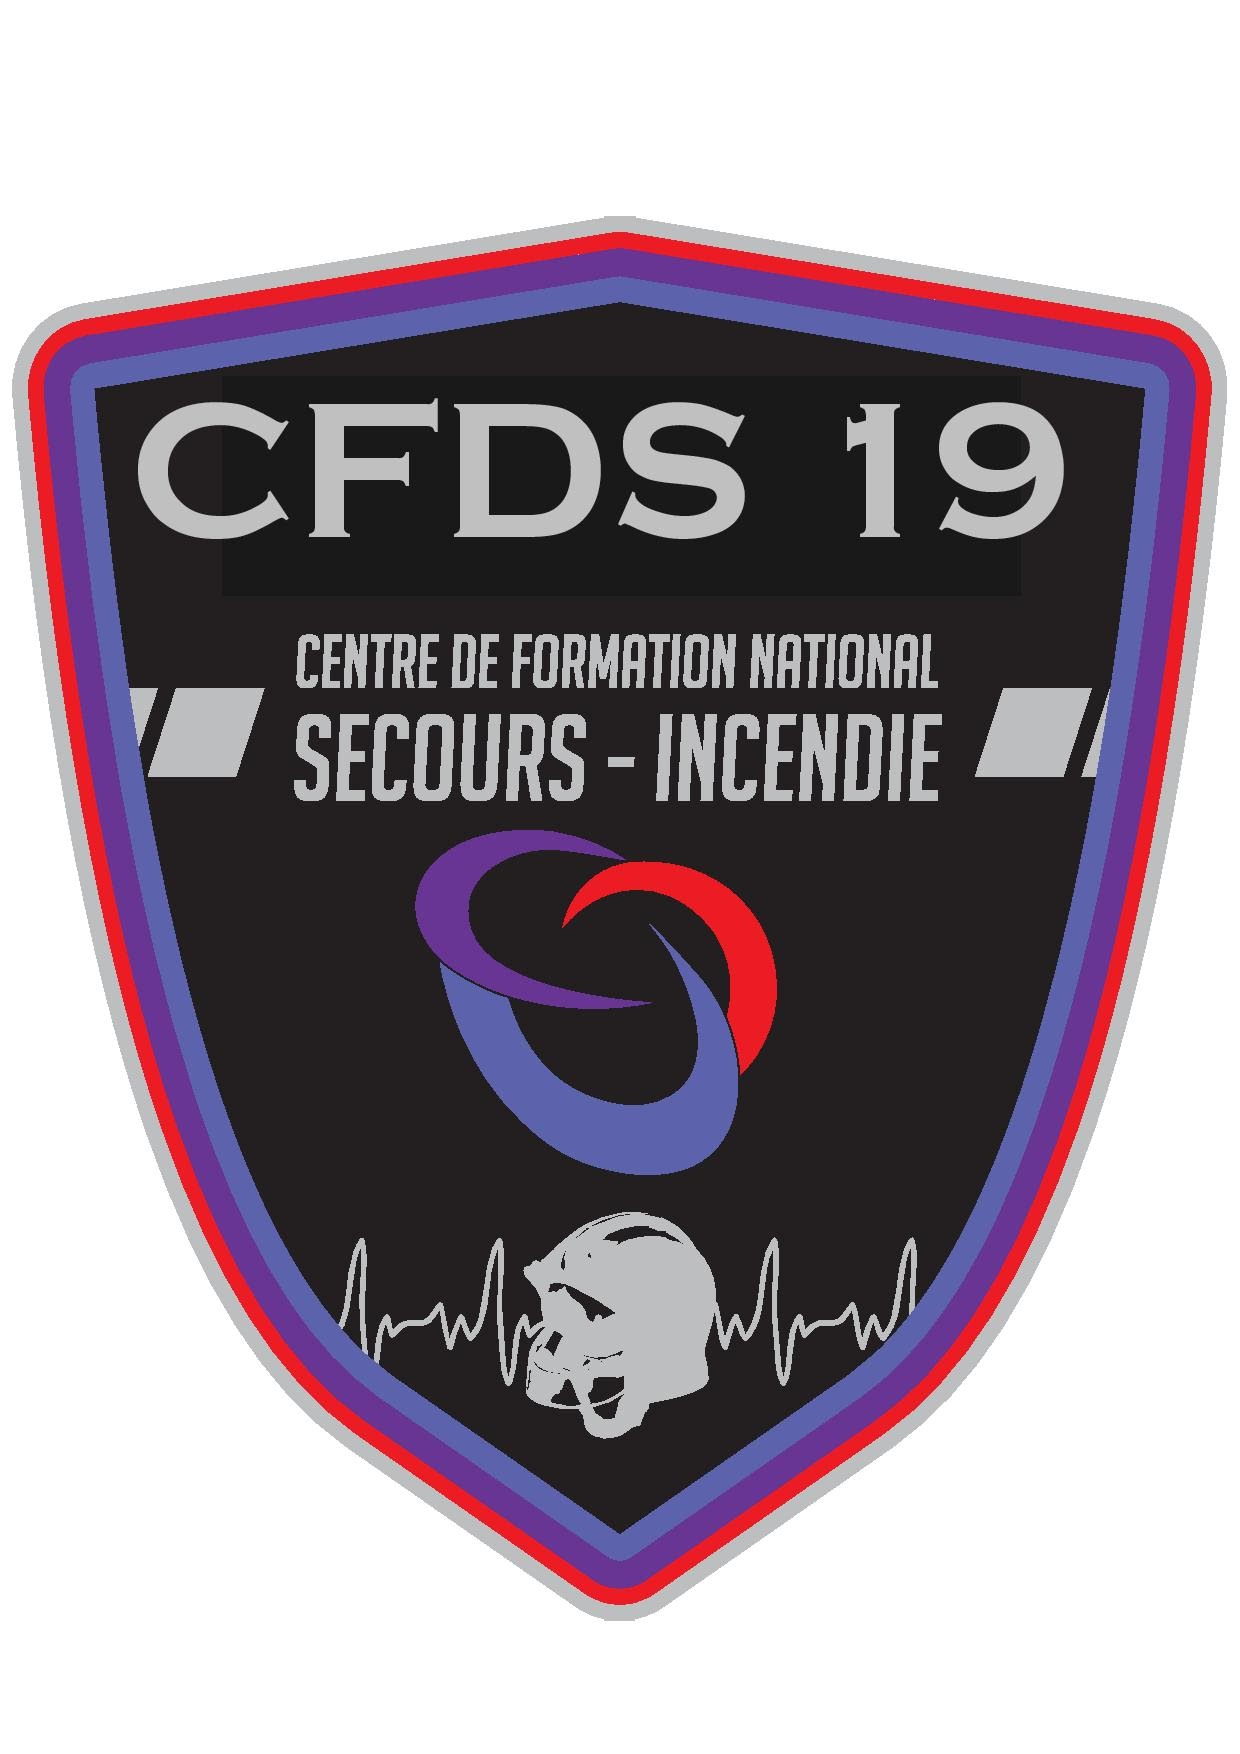 CFDS 19